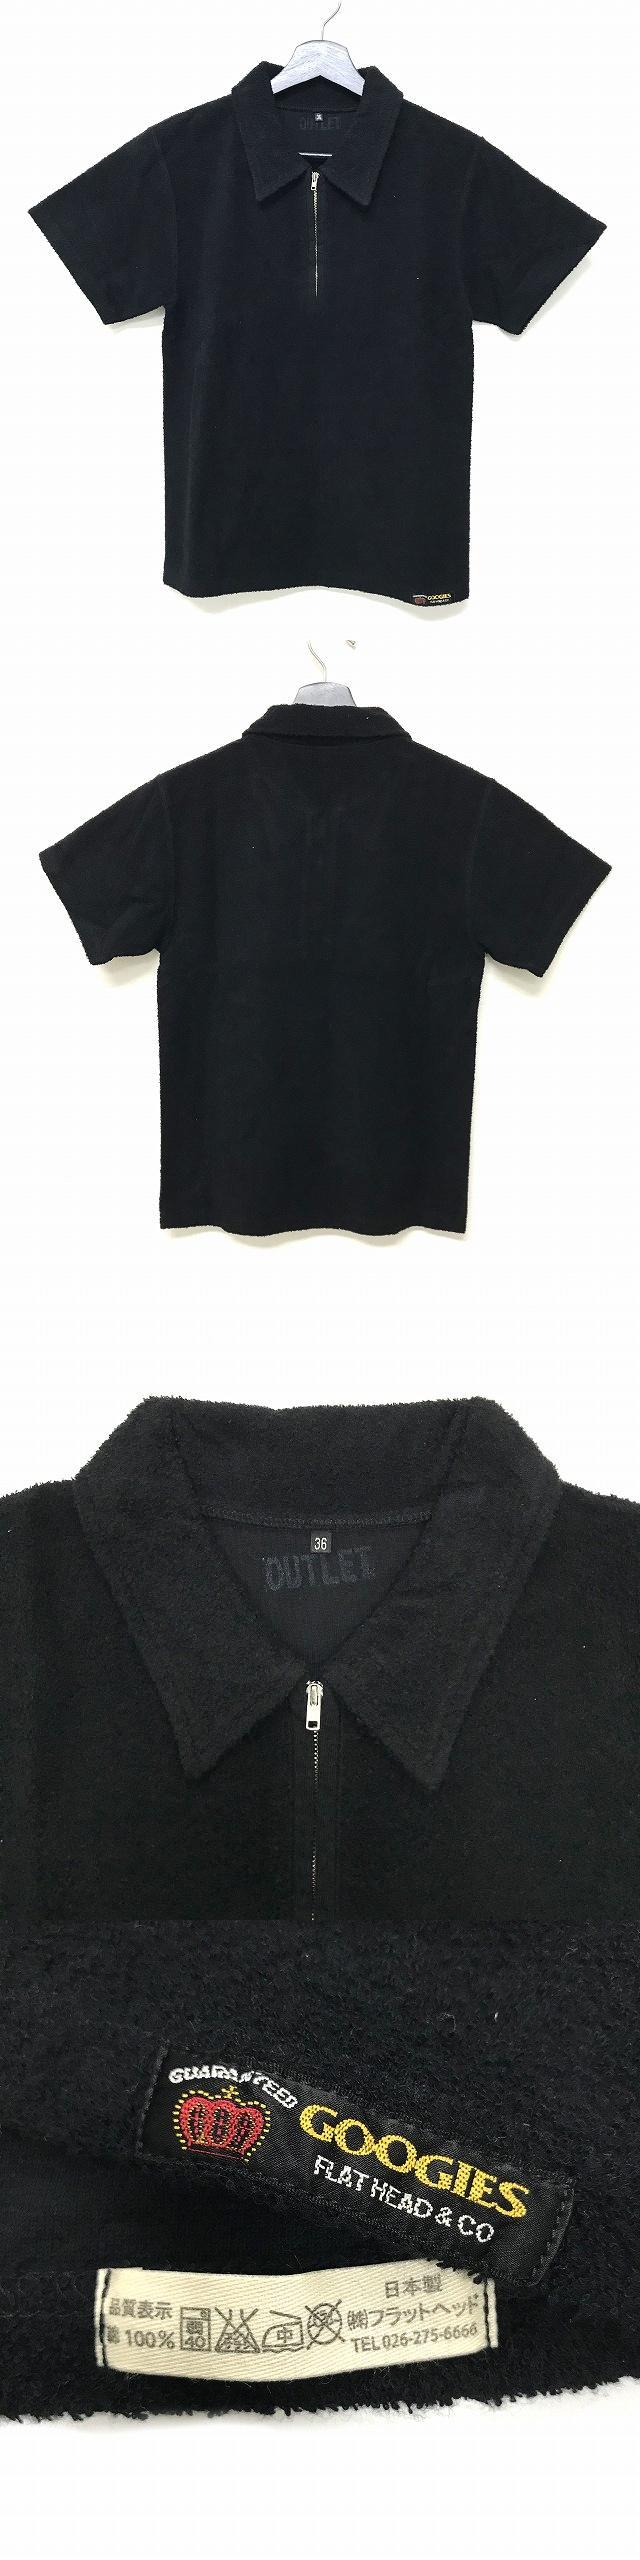 GOOGIES ハーフジップ プルオーバー パイル カットソー ポロシャツ 半袖 ブラック 黒 36